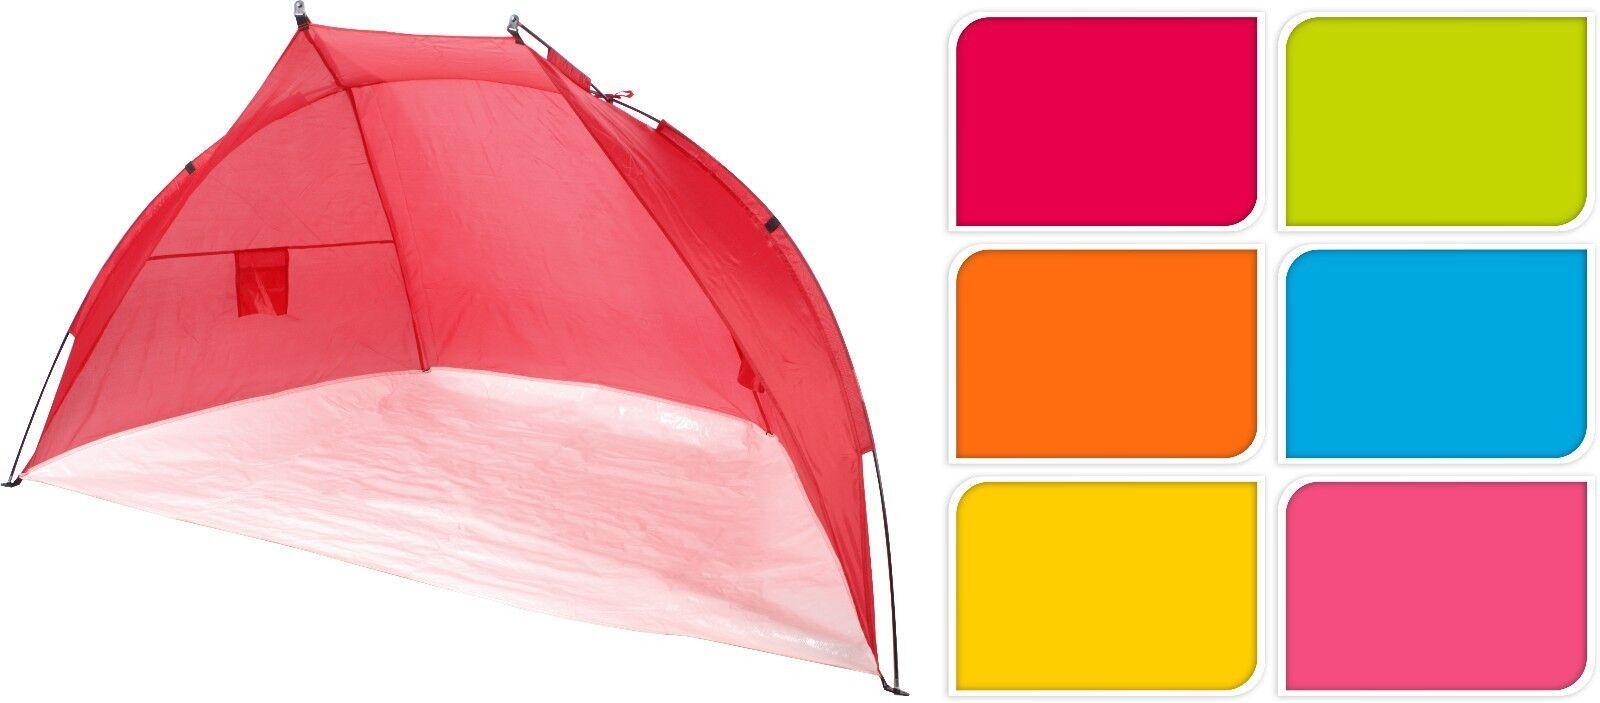 TENT SHELTER beach sun rain wind windbreak protection